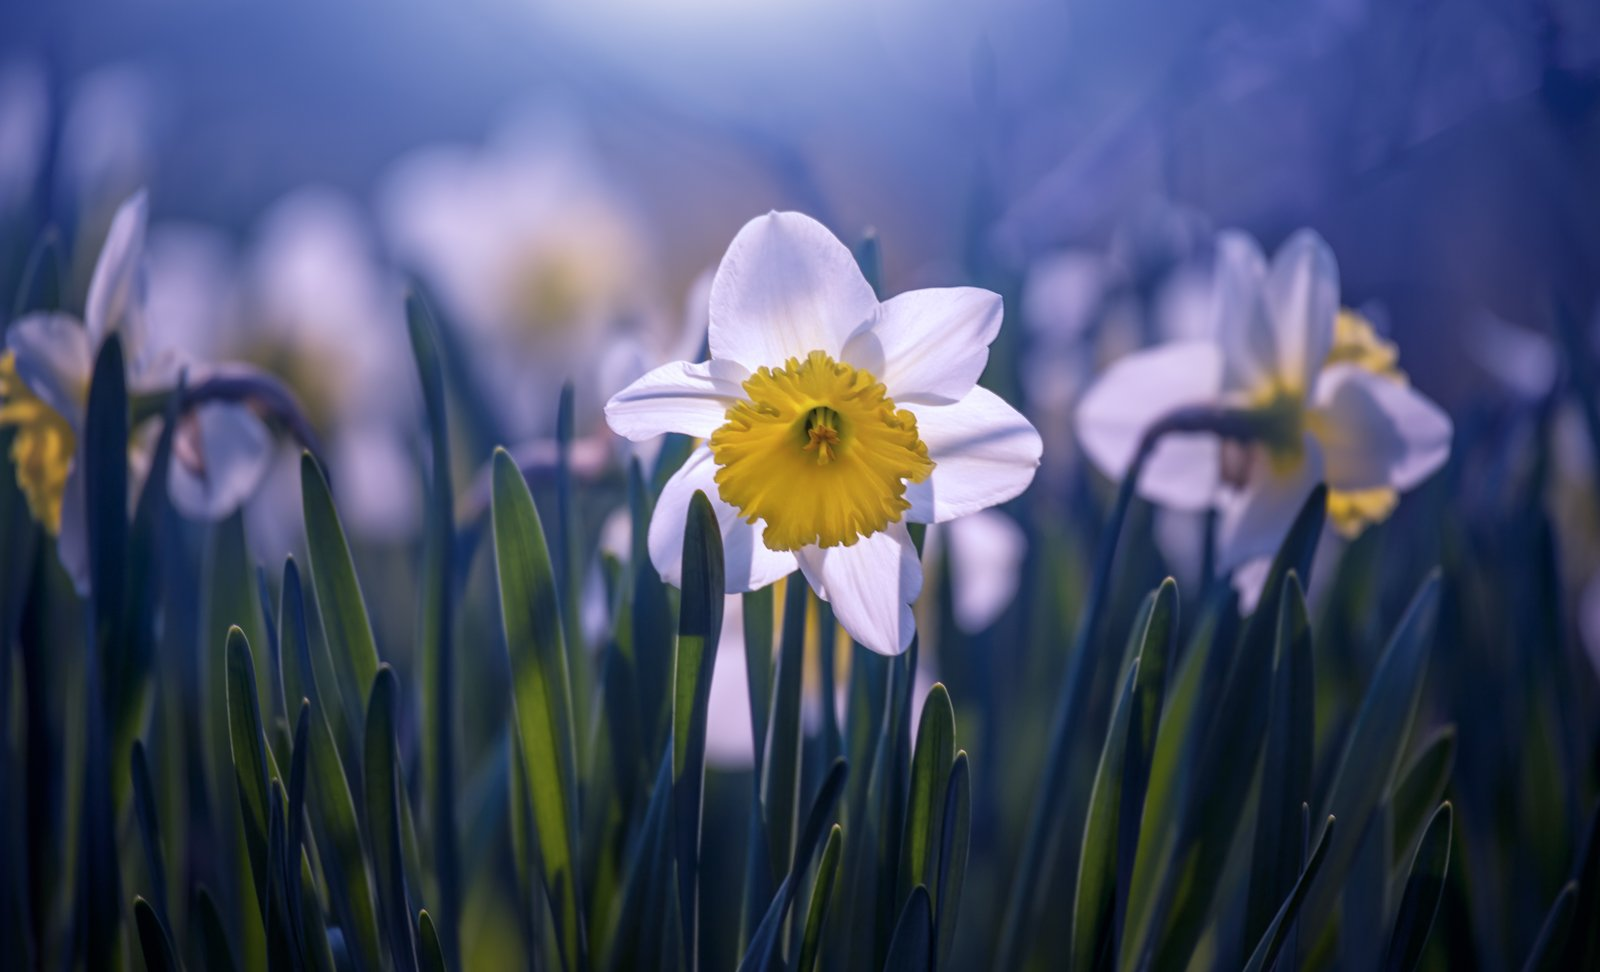 daffodil flower blossom spring white yellow light , Tiger Seo